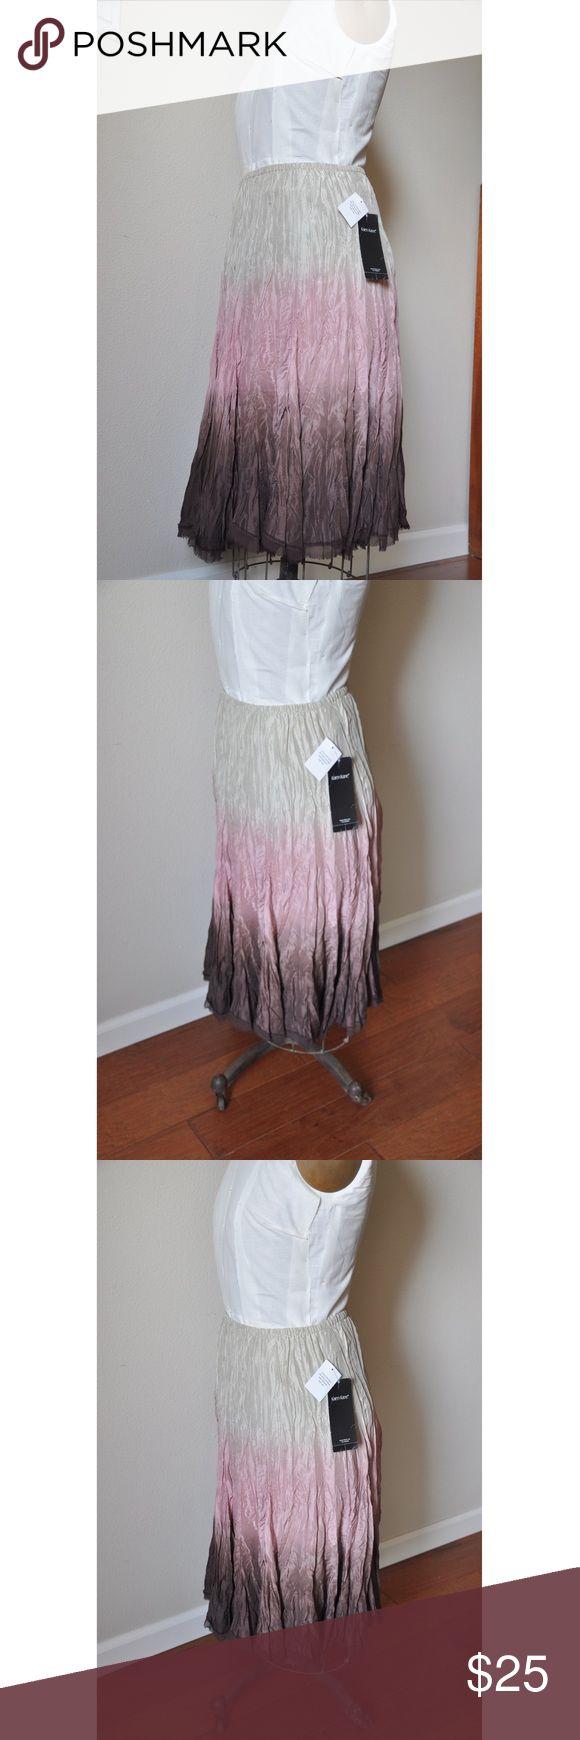 Karen Kane Earth Angel Skirt  >>BRAND NEW<< Boho style Karen Kane Earth Angel skirt. Hand dip dyed garment makes this a very unique skirt. 100% silk. New with tags. Karen Kane Skirts Midi